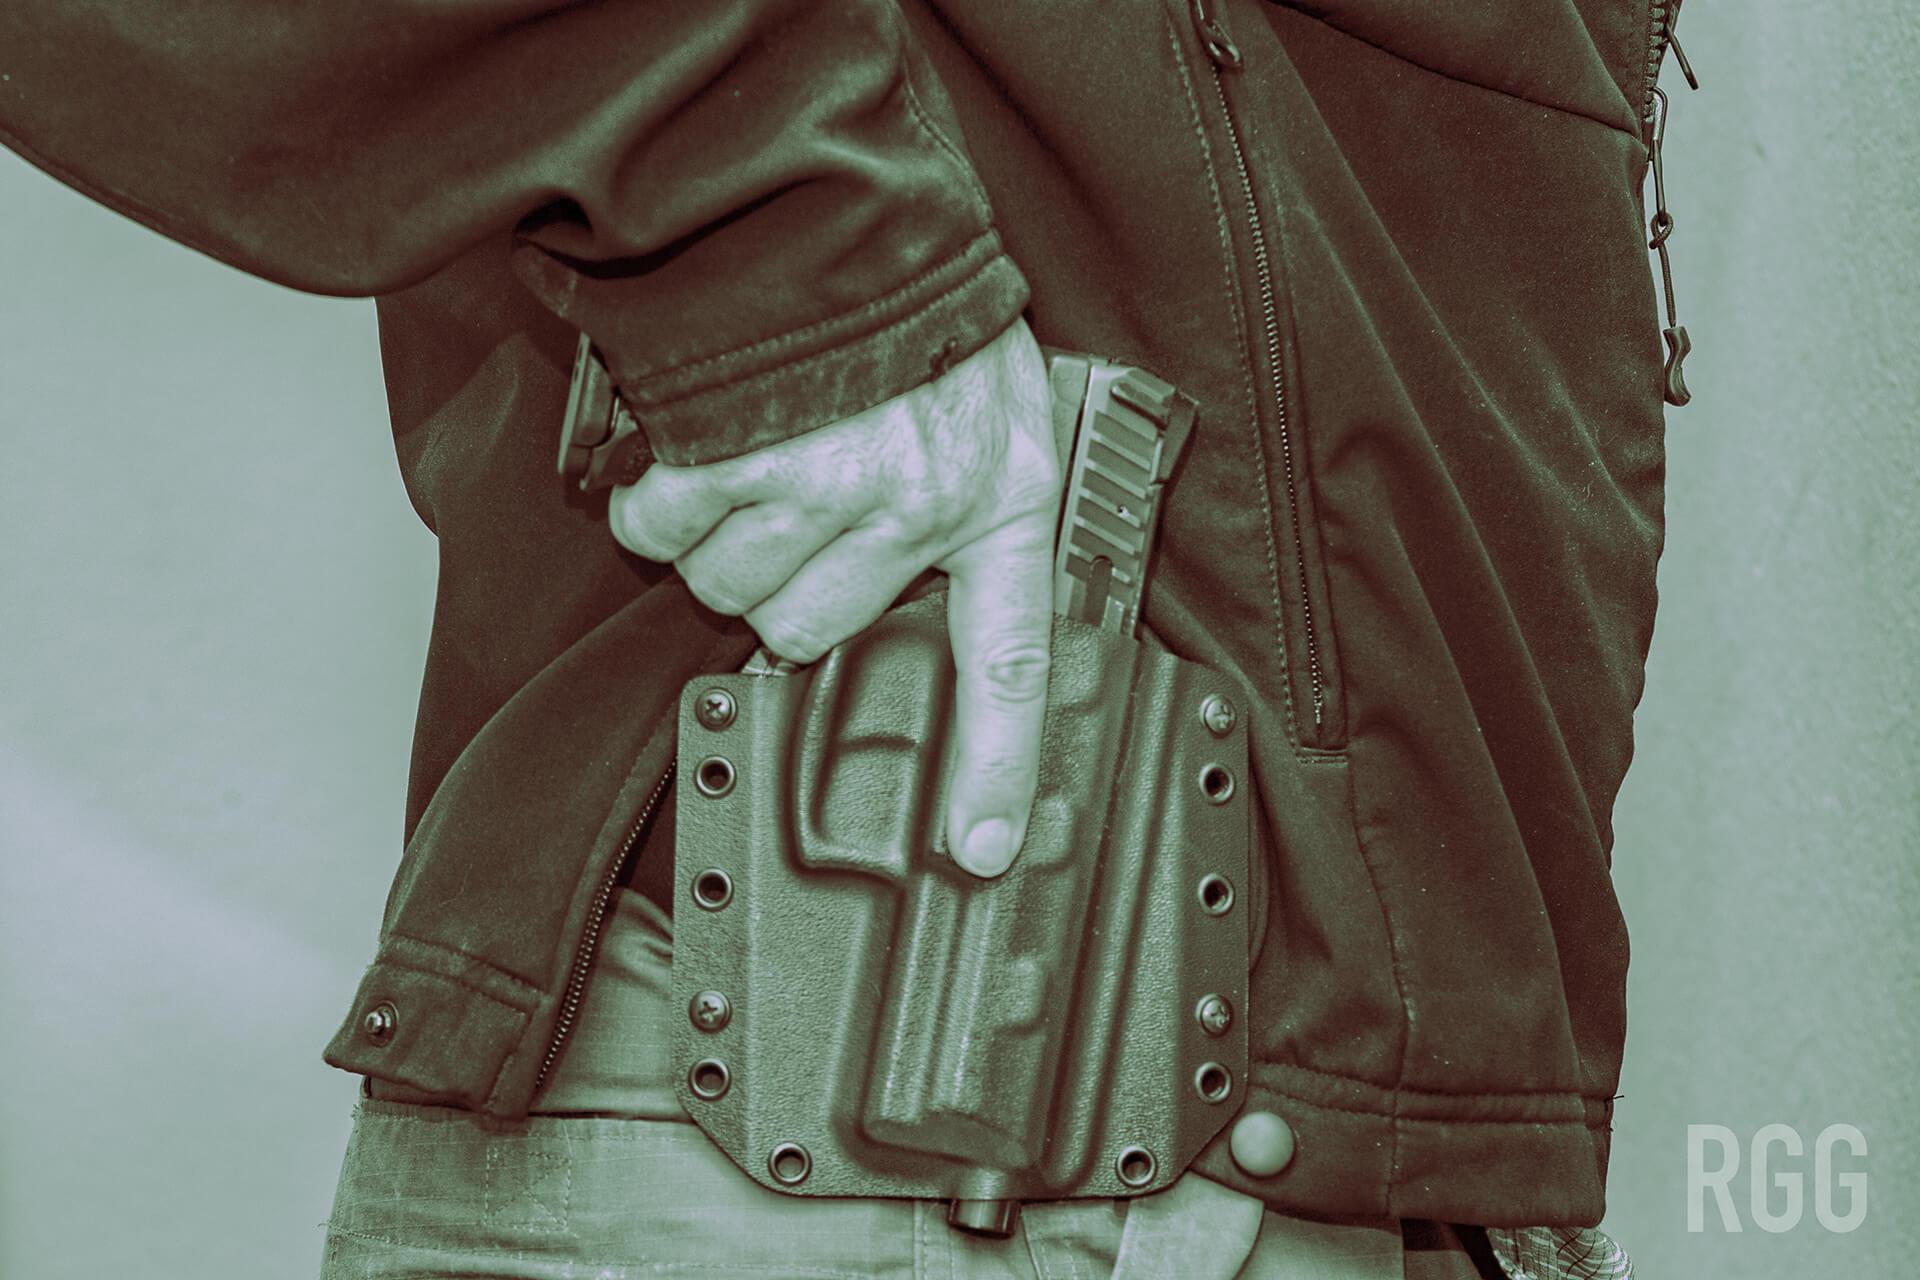 Bravo Concealment's BCA OWB Holster for the H&K VP9